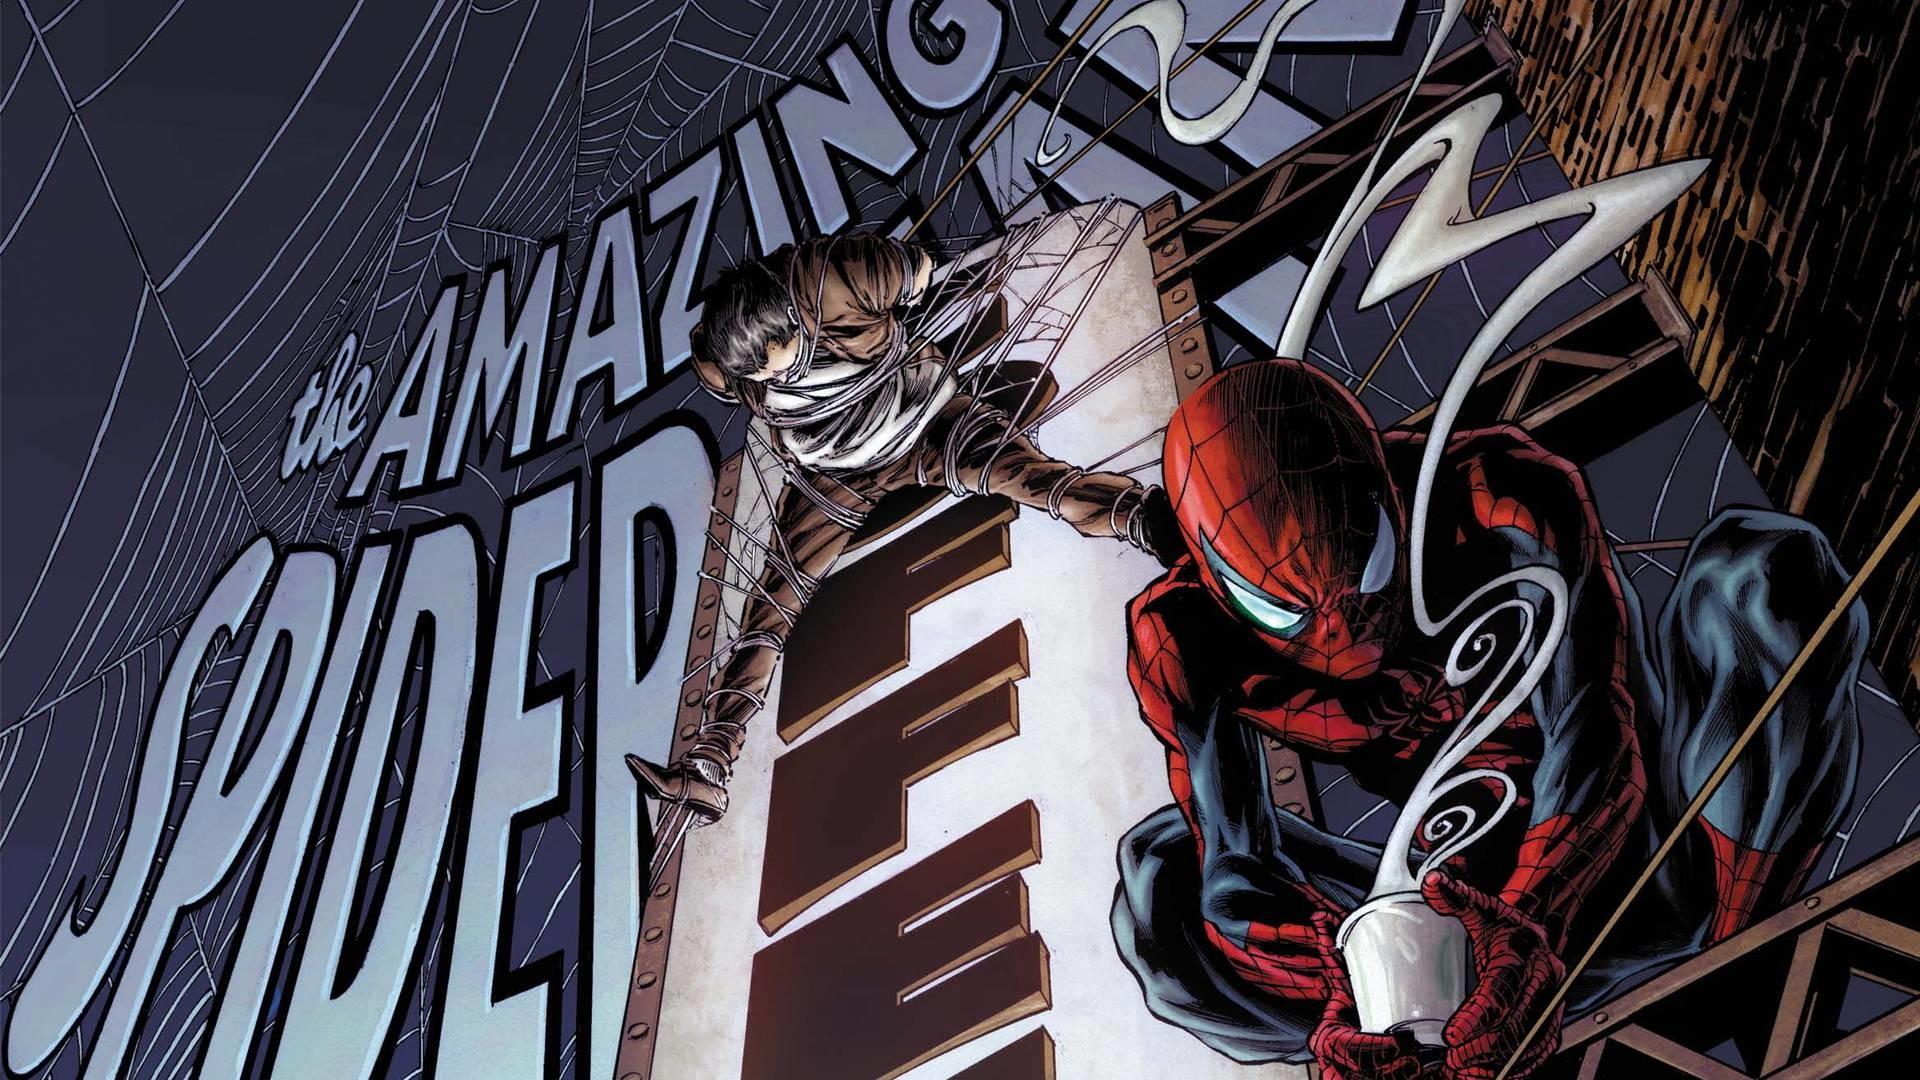 Astounding Marvel Comic Book Wallpaper 1024x768PX ~ Comic Book .